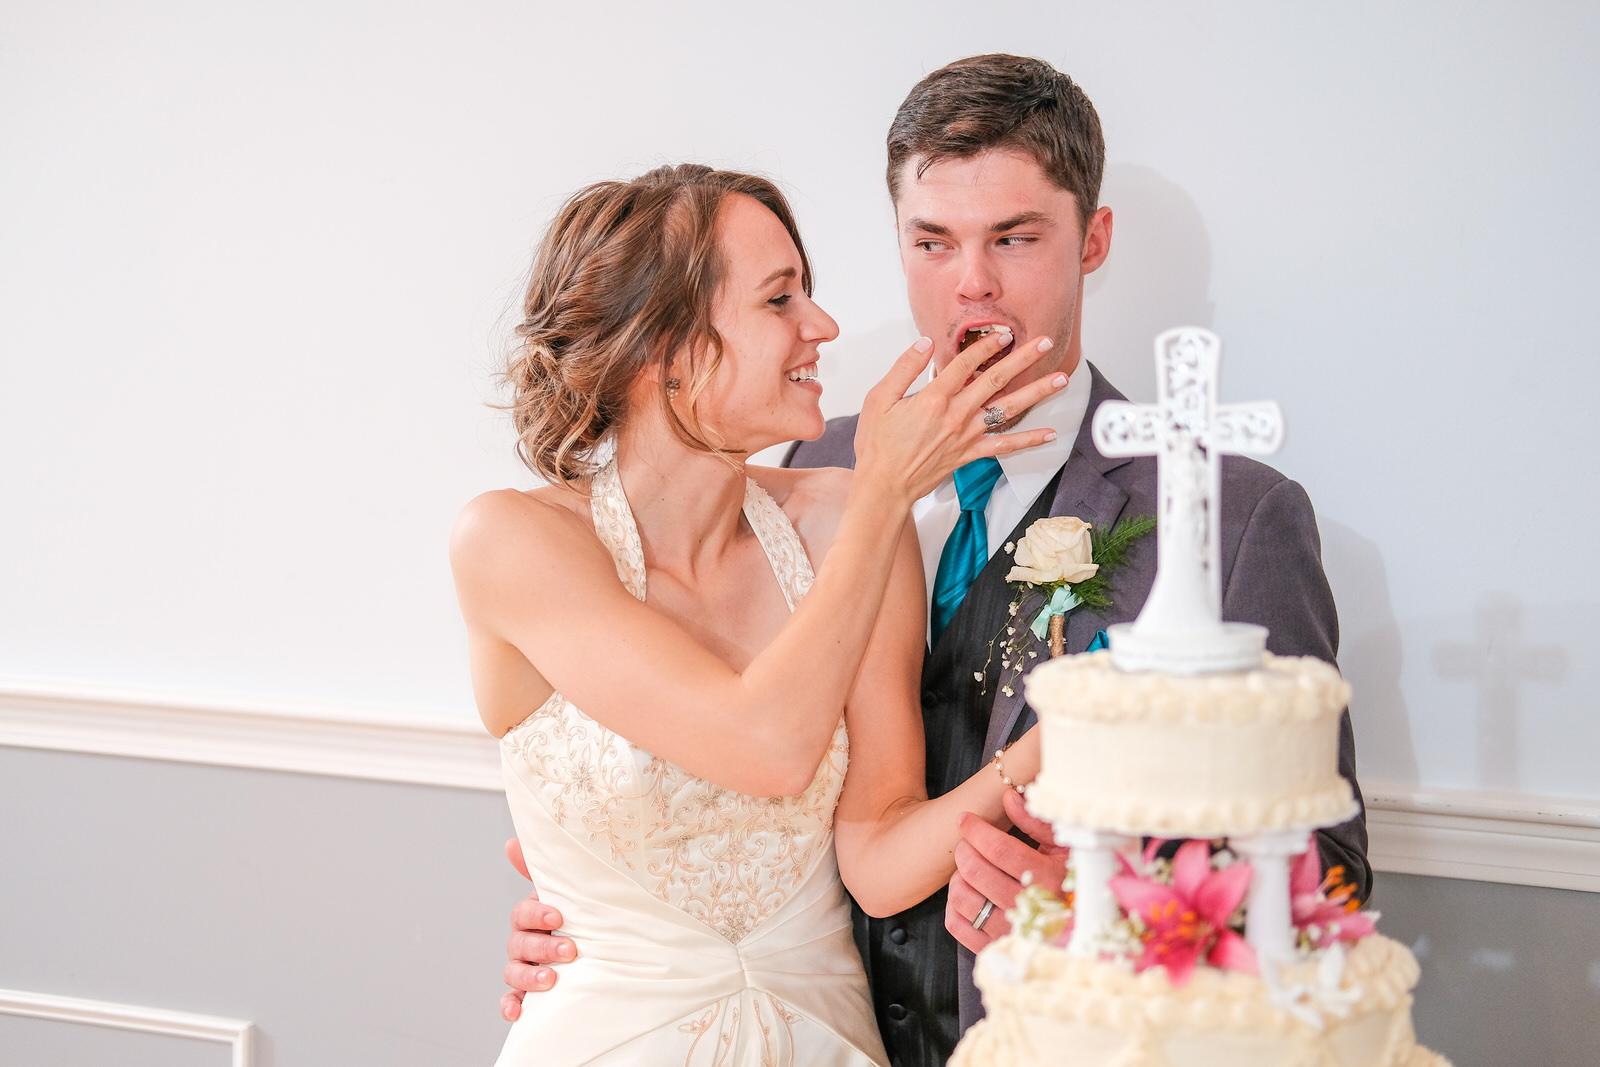 southern-nh-wedding-photography-1100-1.jpg